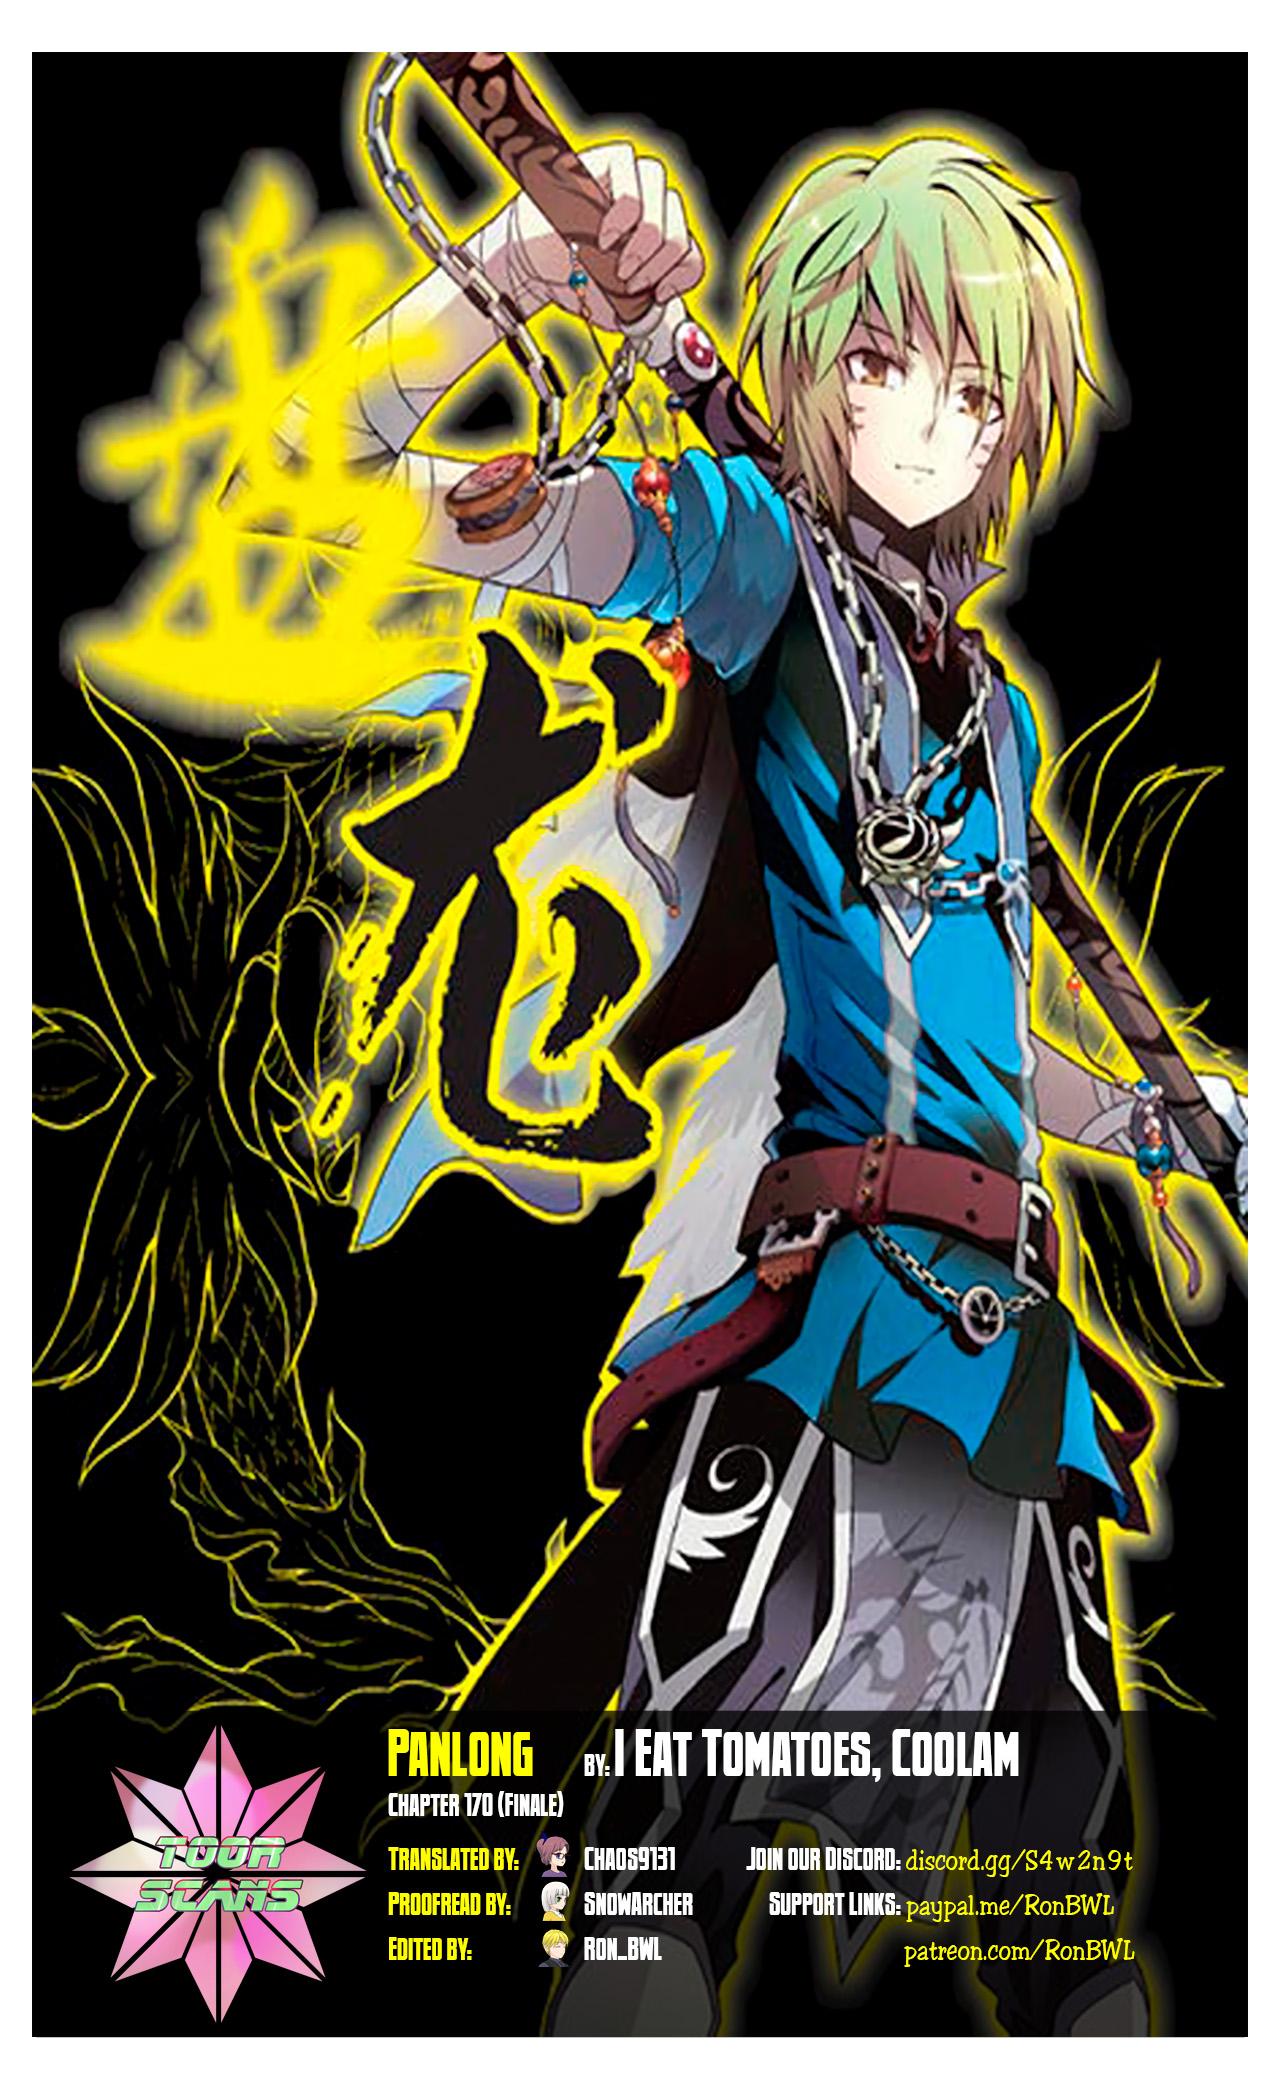 https://manga.mangadogs.com/comics/pic3/21/213/1521619/bfb1e233aabeb71729f501798f85f4f4.jpg Page 1